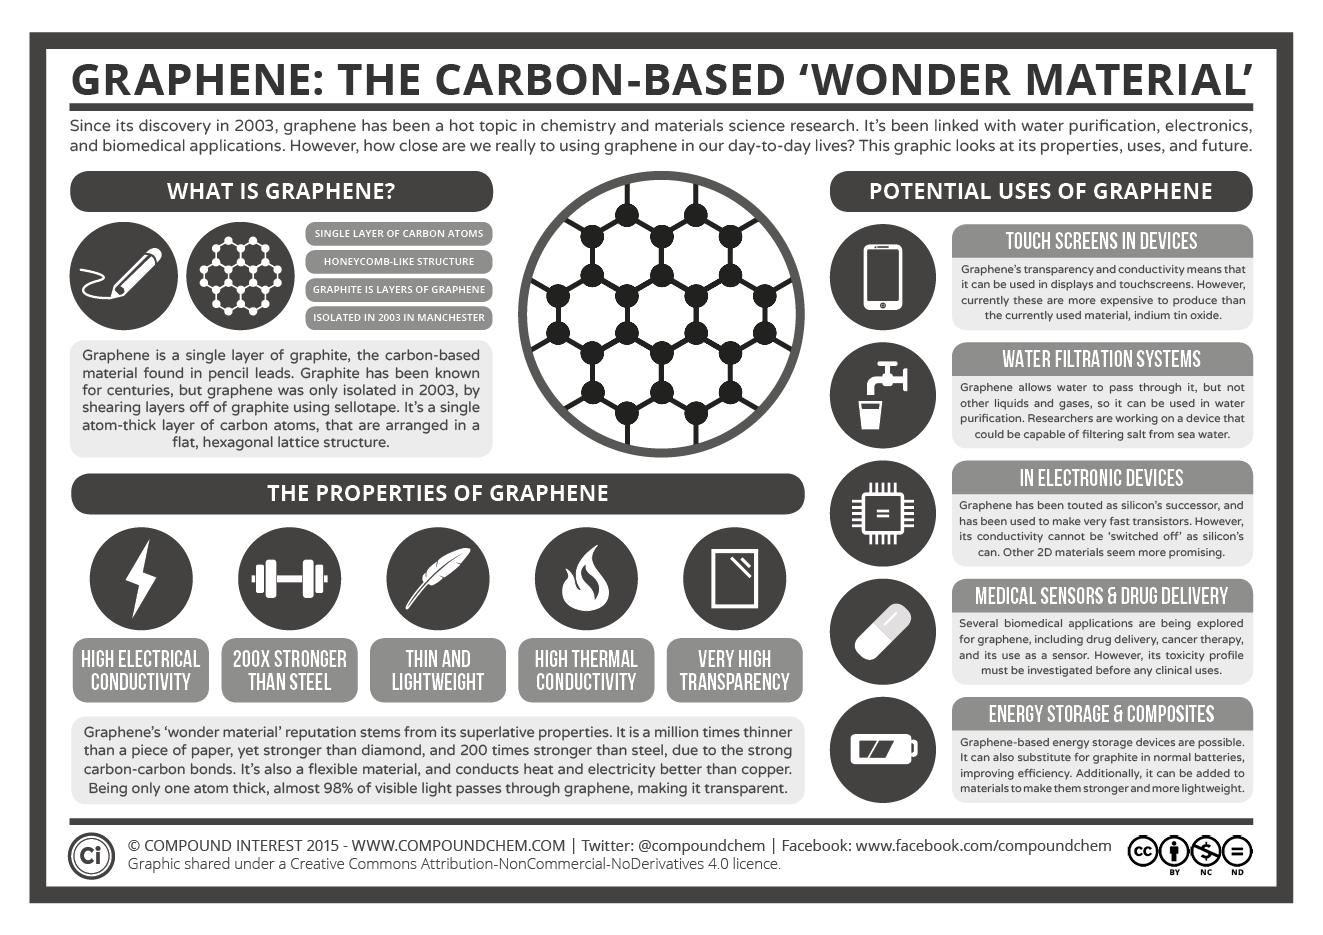 Graphene - The Carbon-Based Wonder Material